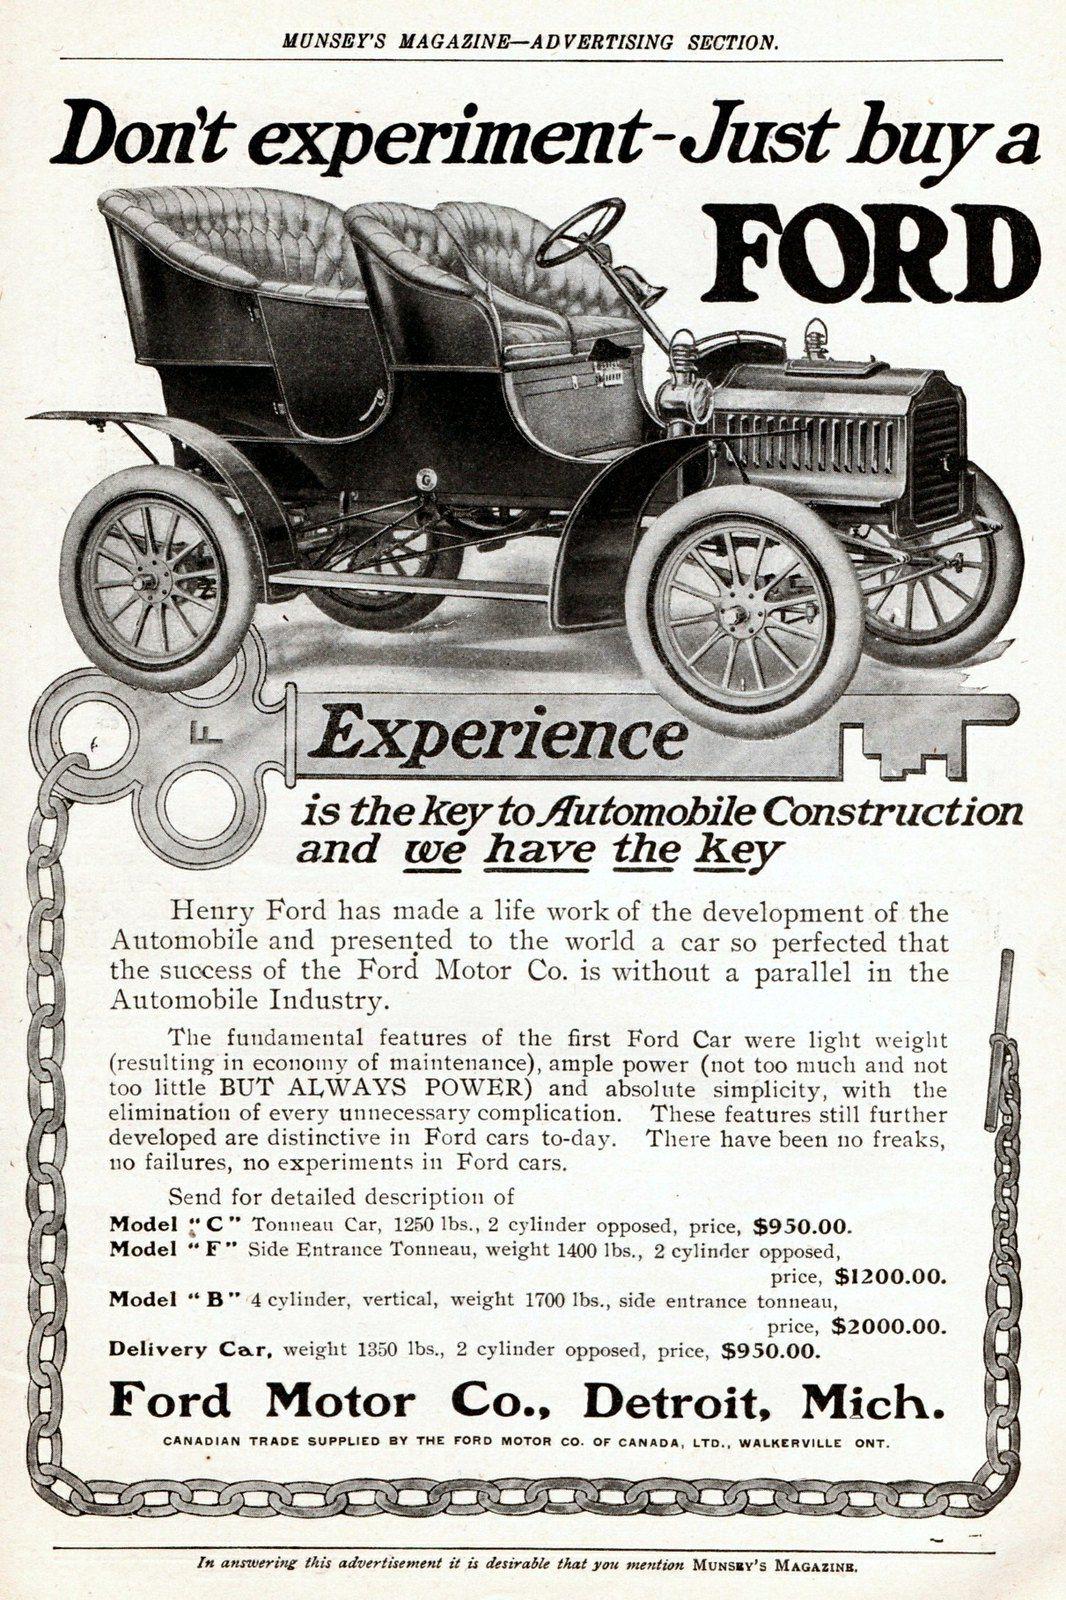 1905 Ford Model F Side Entrance Tonneau Ford Models Ford Ford